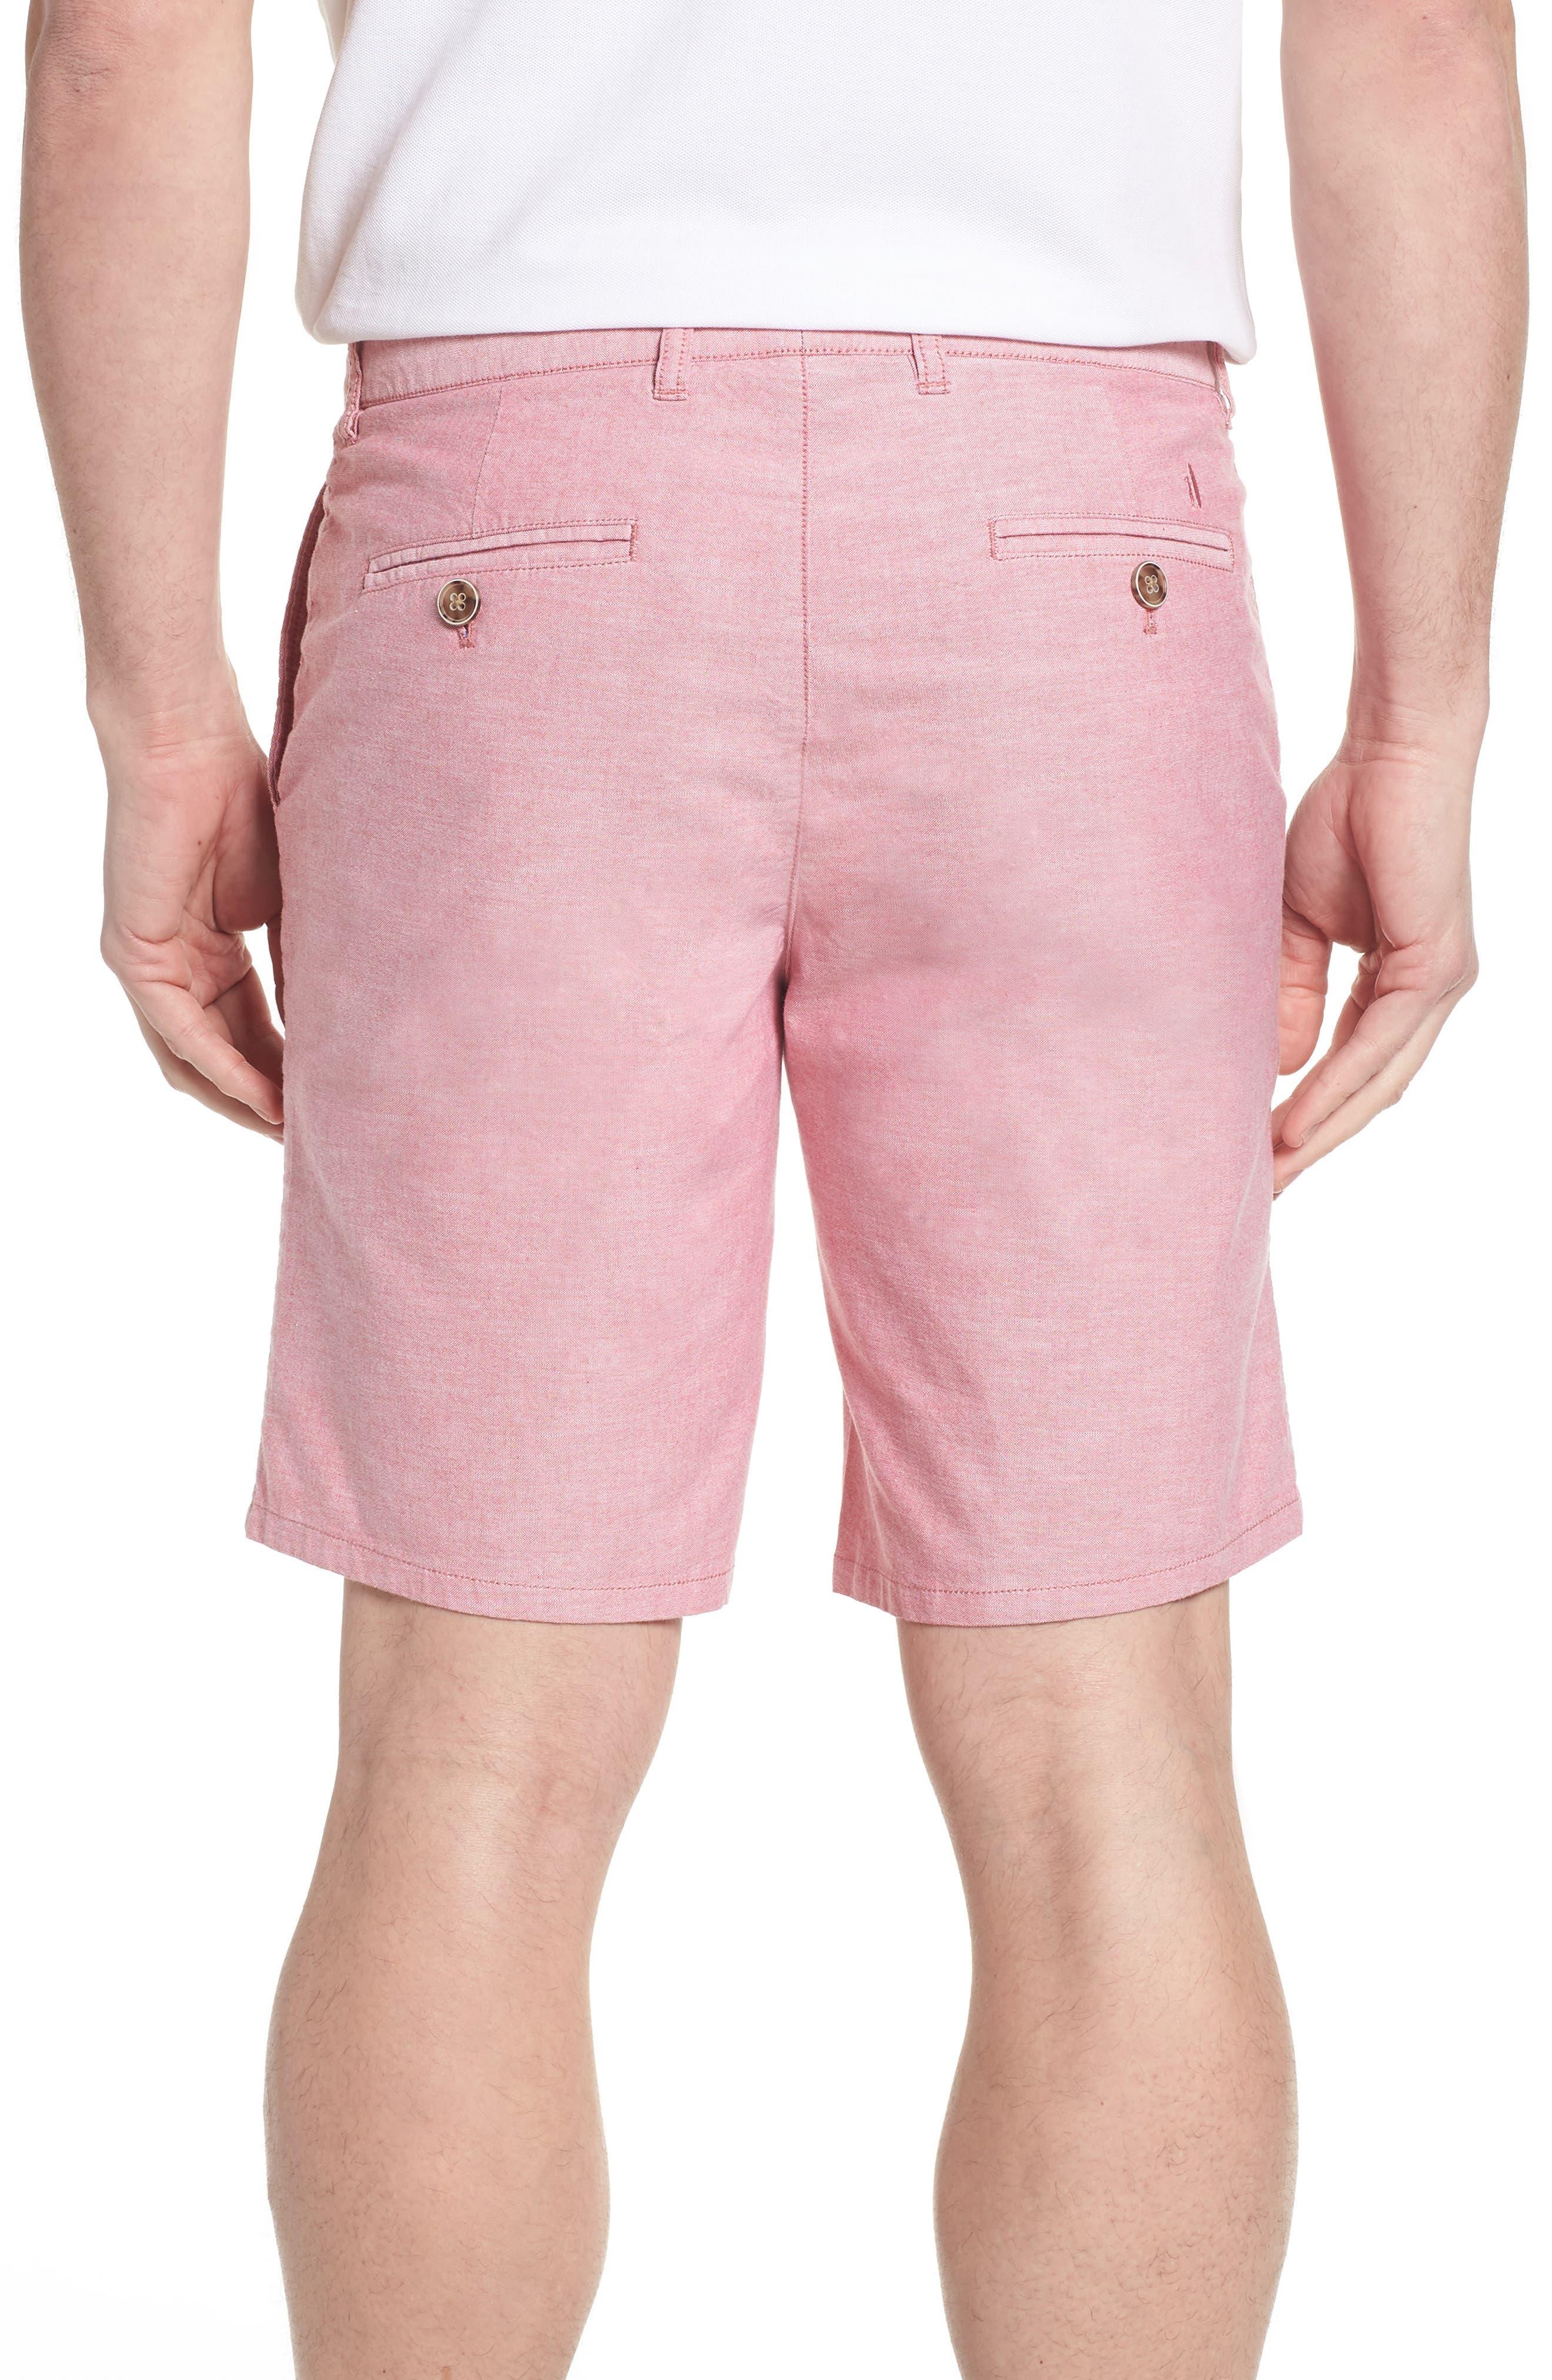 Merritt Regular Fit Shorts,                             Alternate thumbnail 2, color,                             Malibu Red